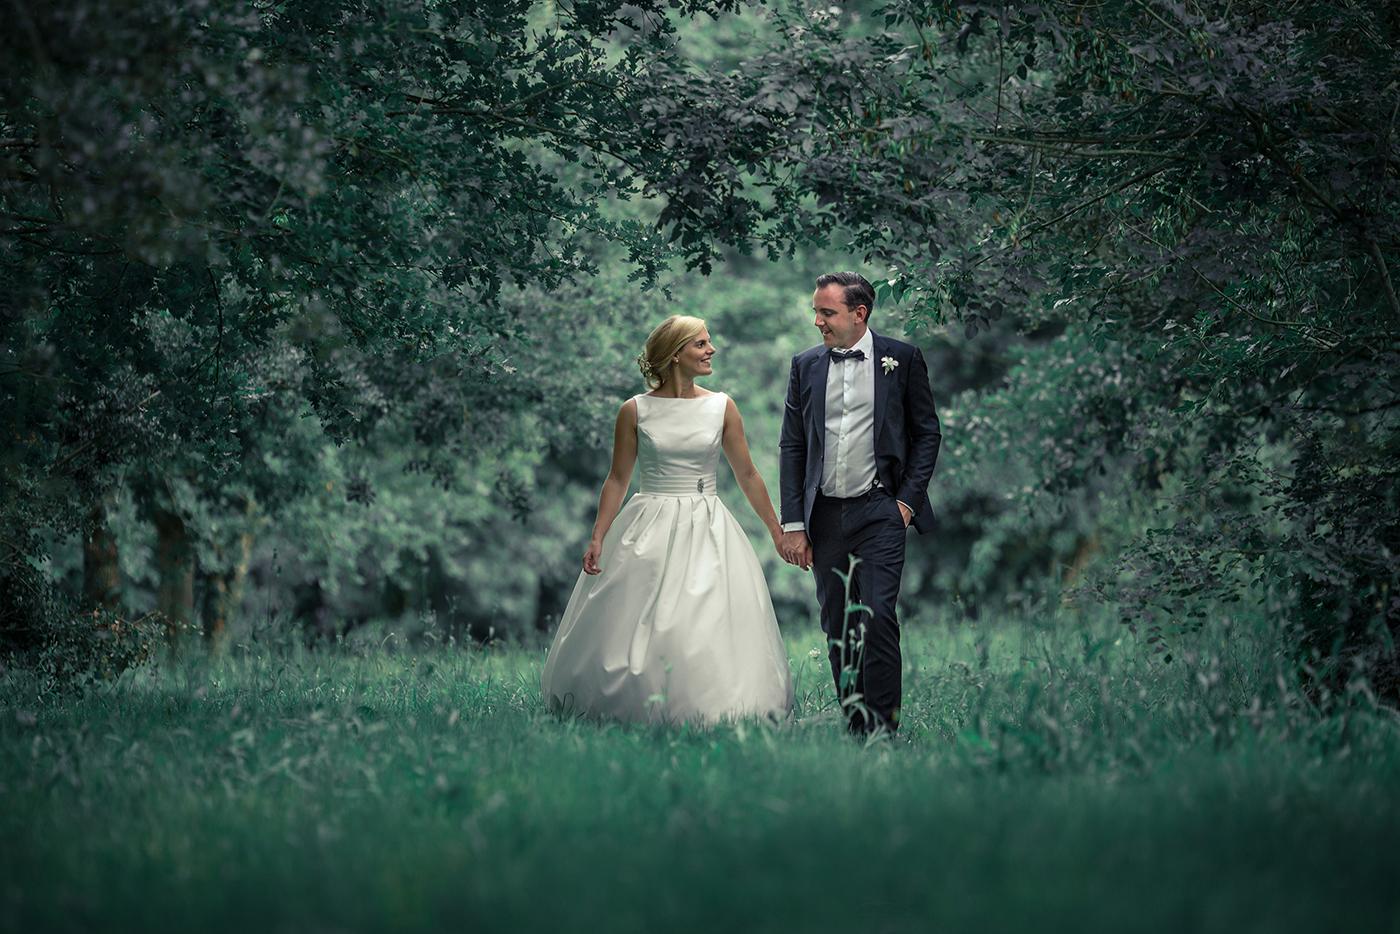 Photographe-mariage-couple-guillaume-heraud-03